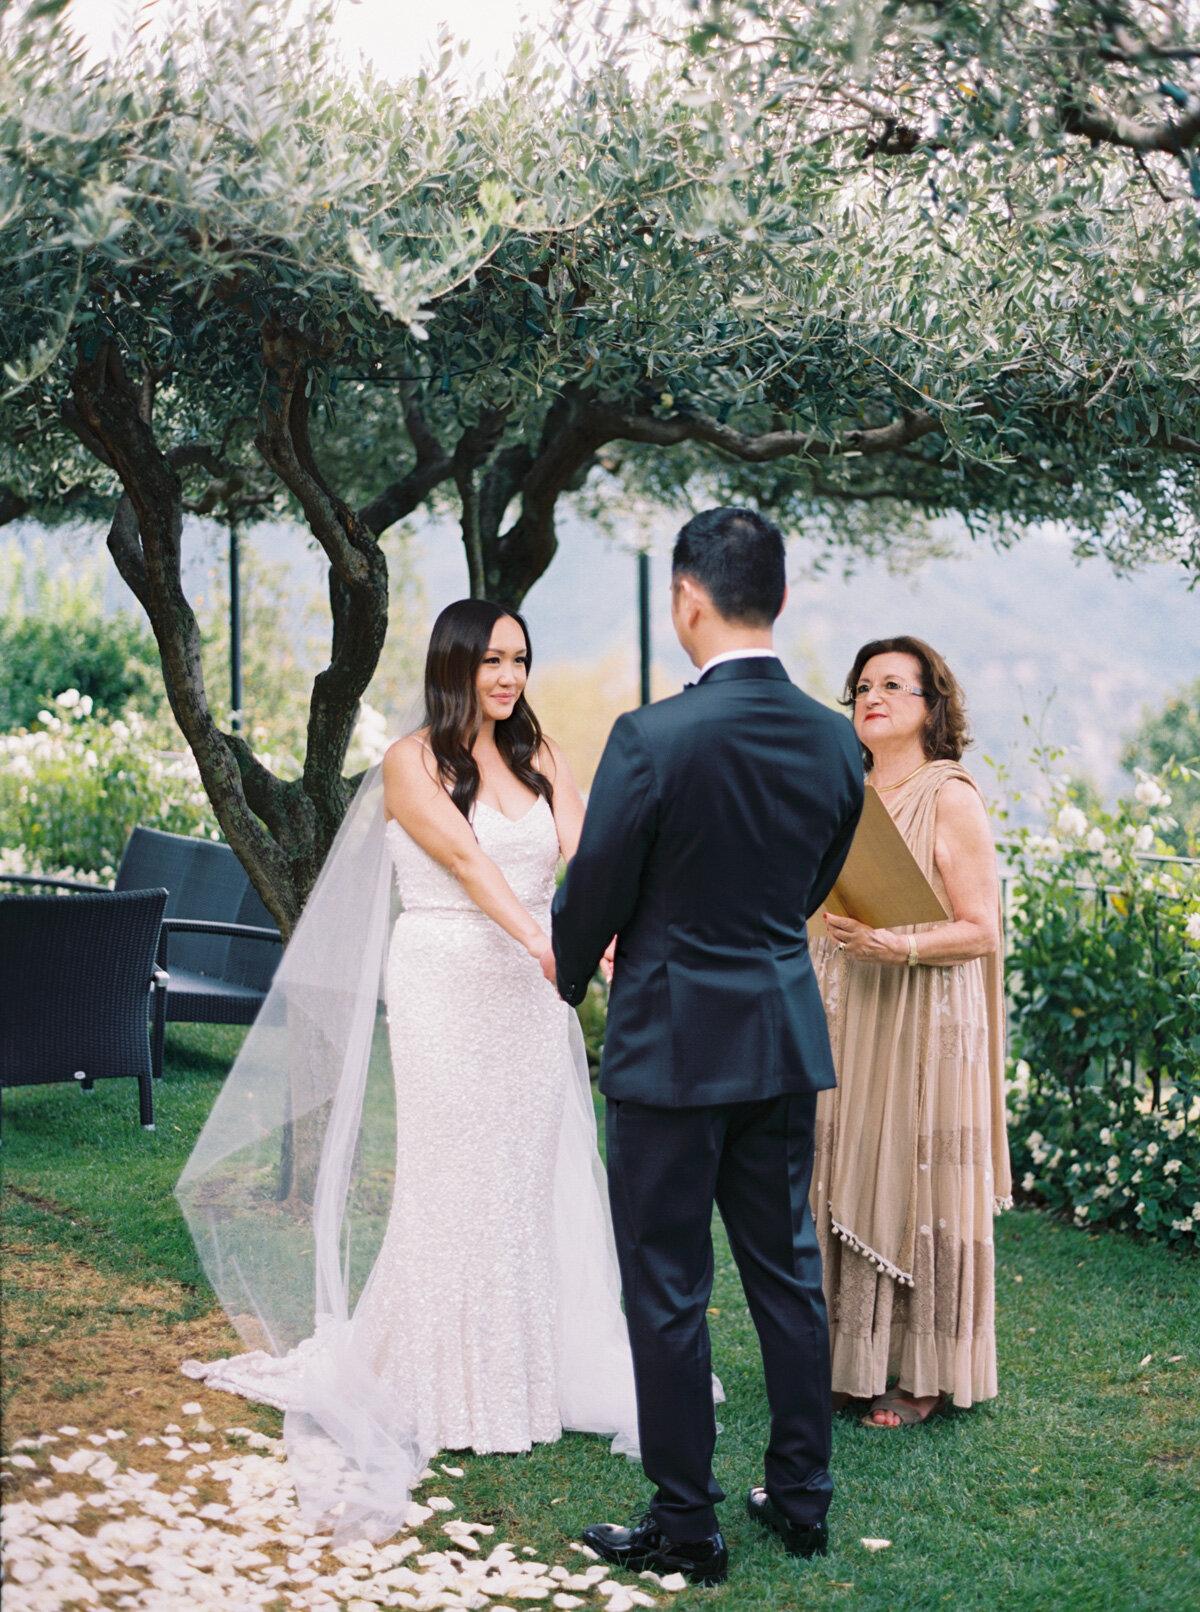 Belmond-Hotel-Caruso-ravello-elopement-Katie-Grant-destination-wedding (26 of 50).jpg